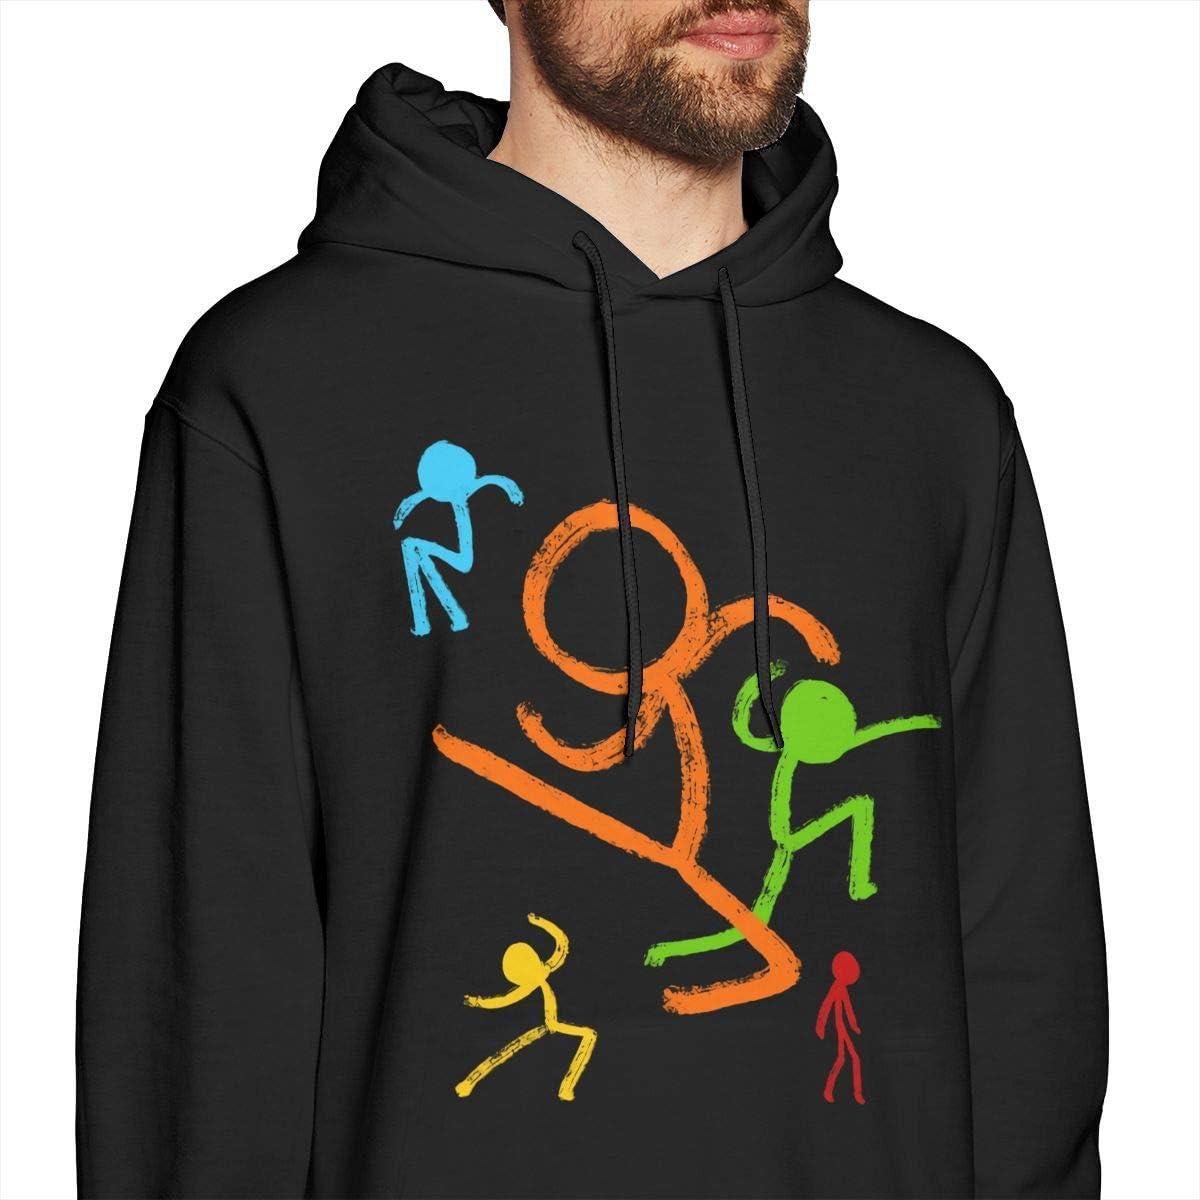 Sudaderas de Hombre Five Stick Figures Alan Becker ManS Hoodie Sweater Fashion Classic Long Sleeve Top Hoodies Hooded Sweatshirt Casual Top